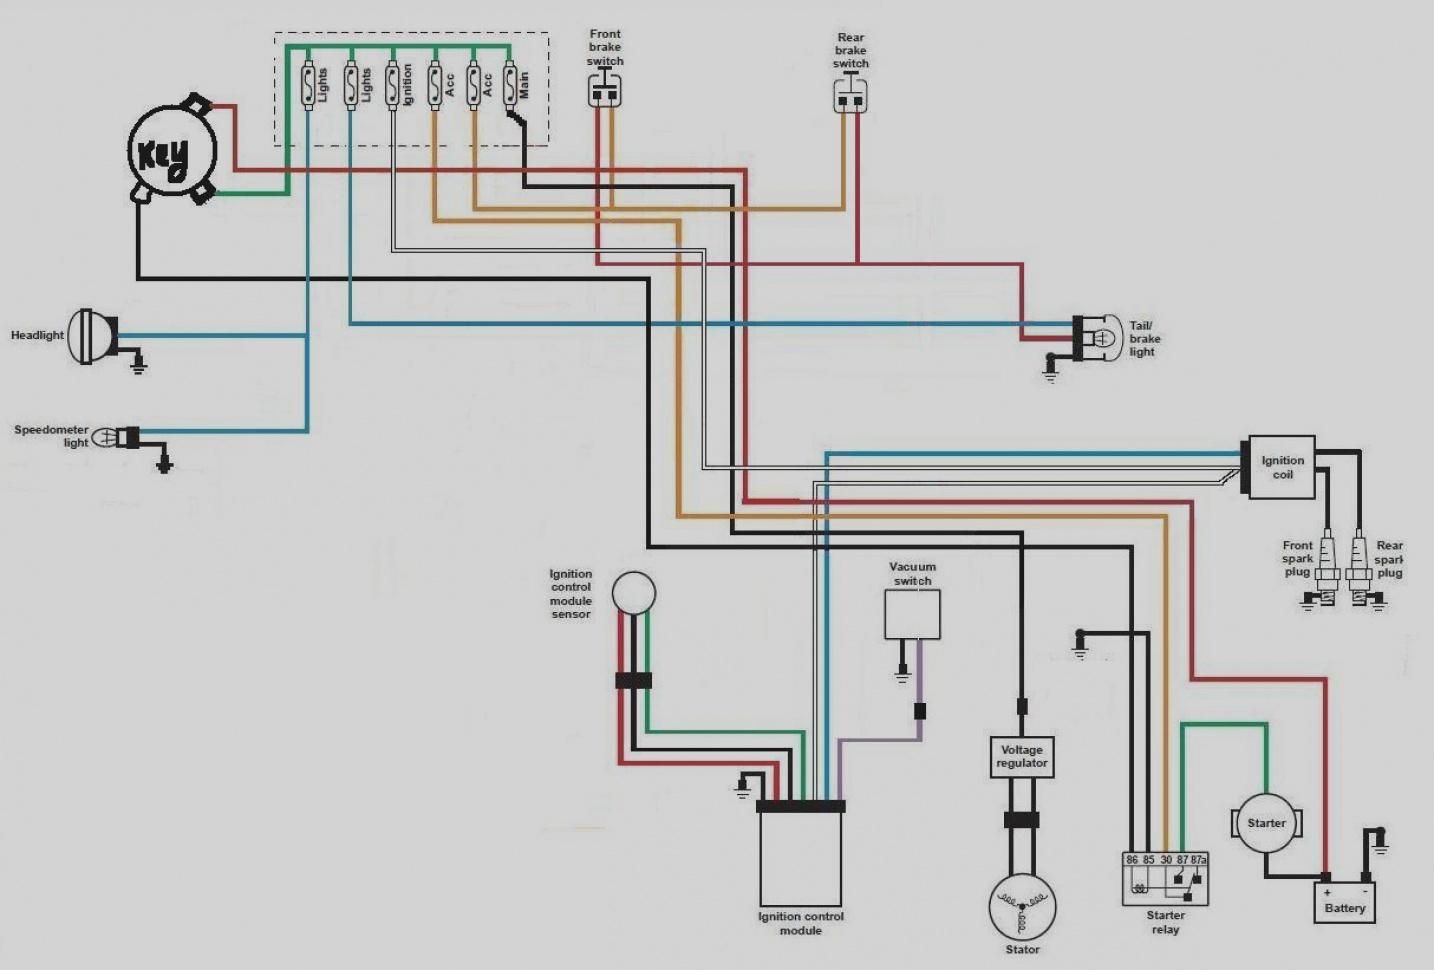 87 corvette wiring diagram free download xx 7178  ignition coil wiring diagram harley davidson wiring  ignition coil wiring diagram harley